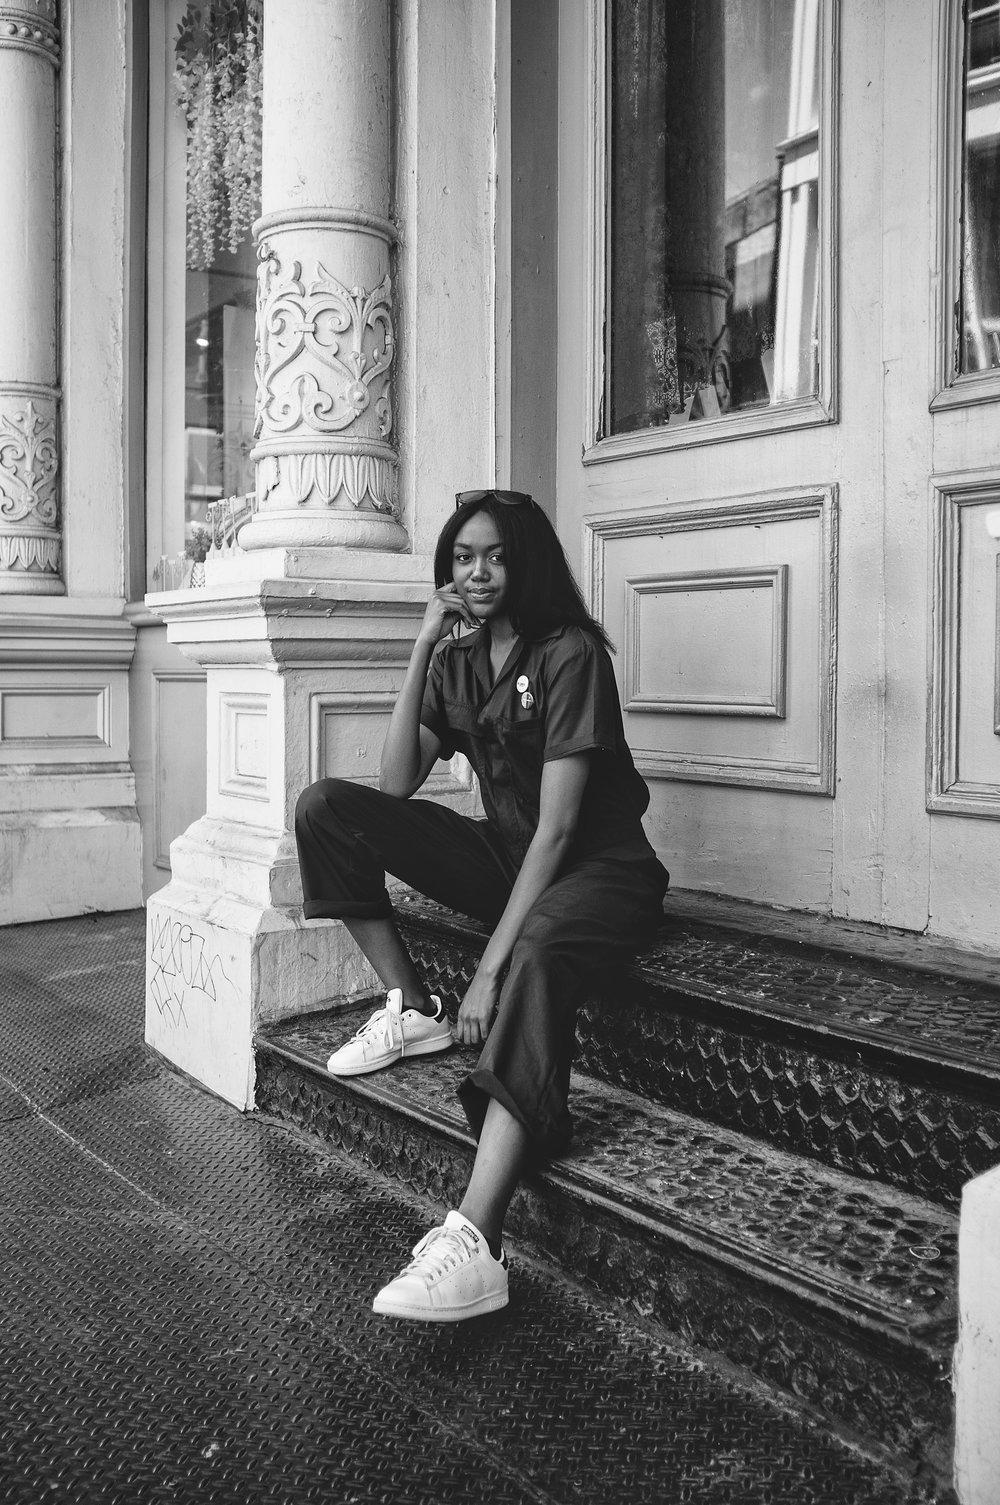 Jaylin Paschal - New York, New York